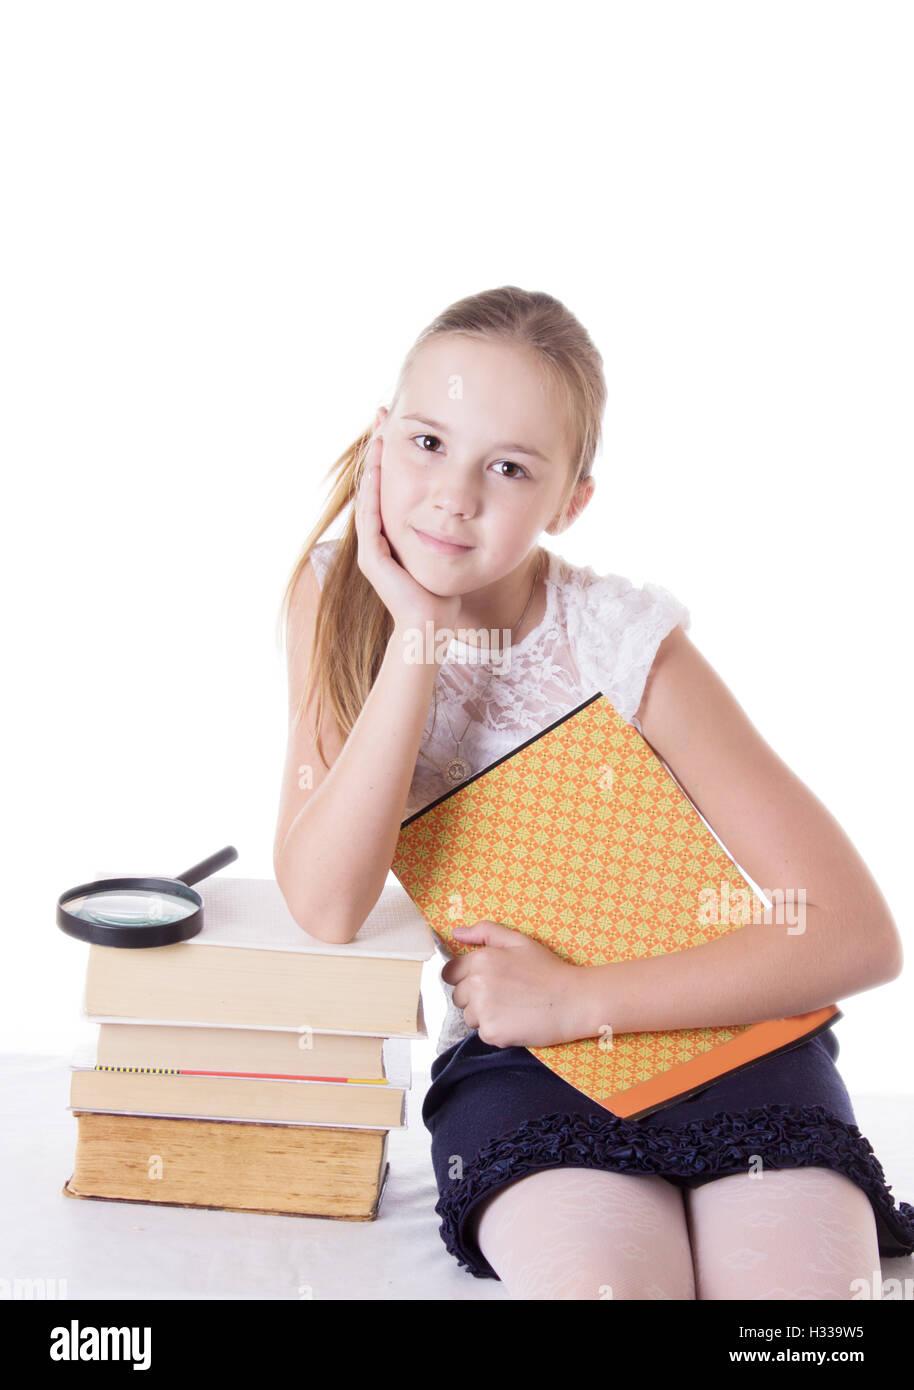 bdfb9b91b36 Beautiful Girl Holding Open Book Stock Photos & Beautiful Girl ...